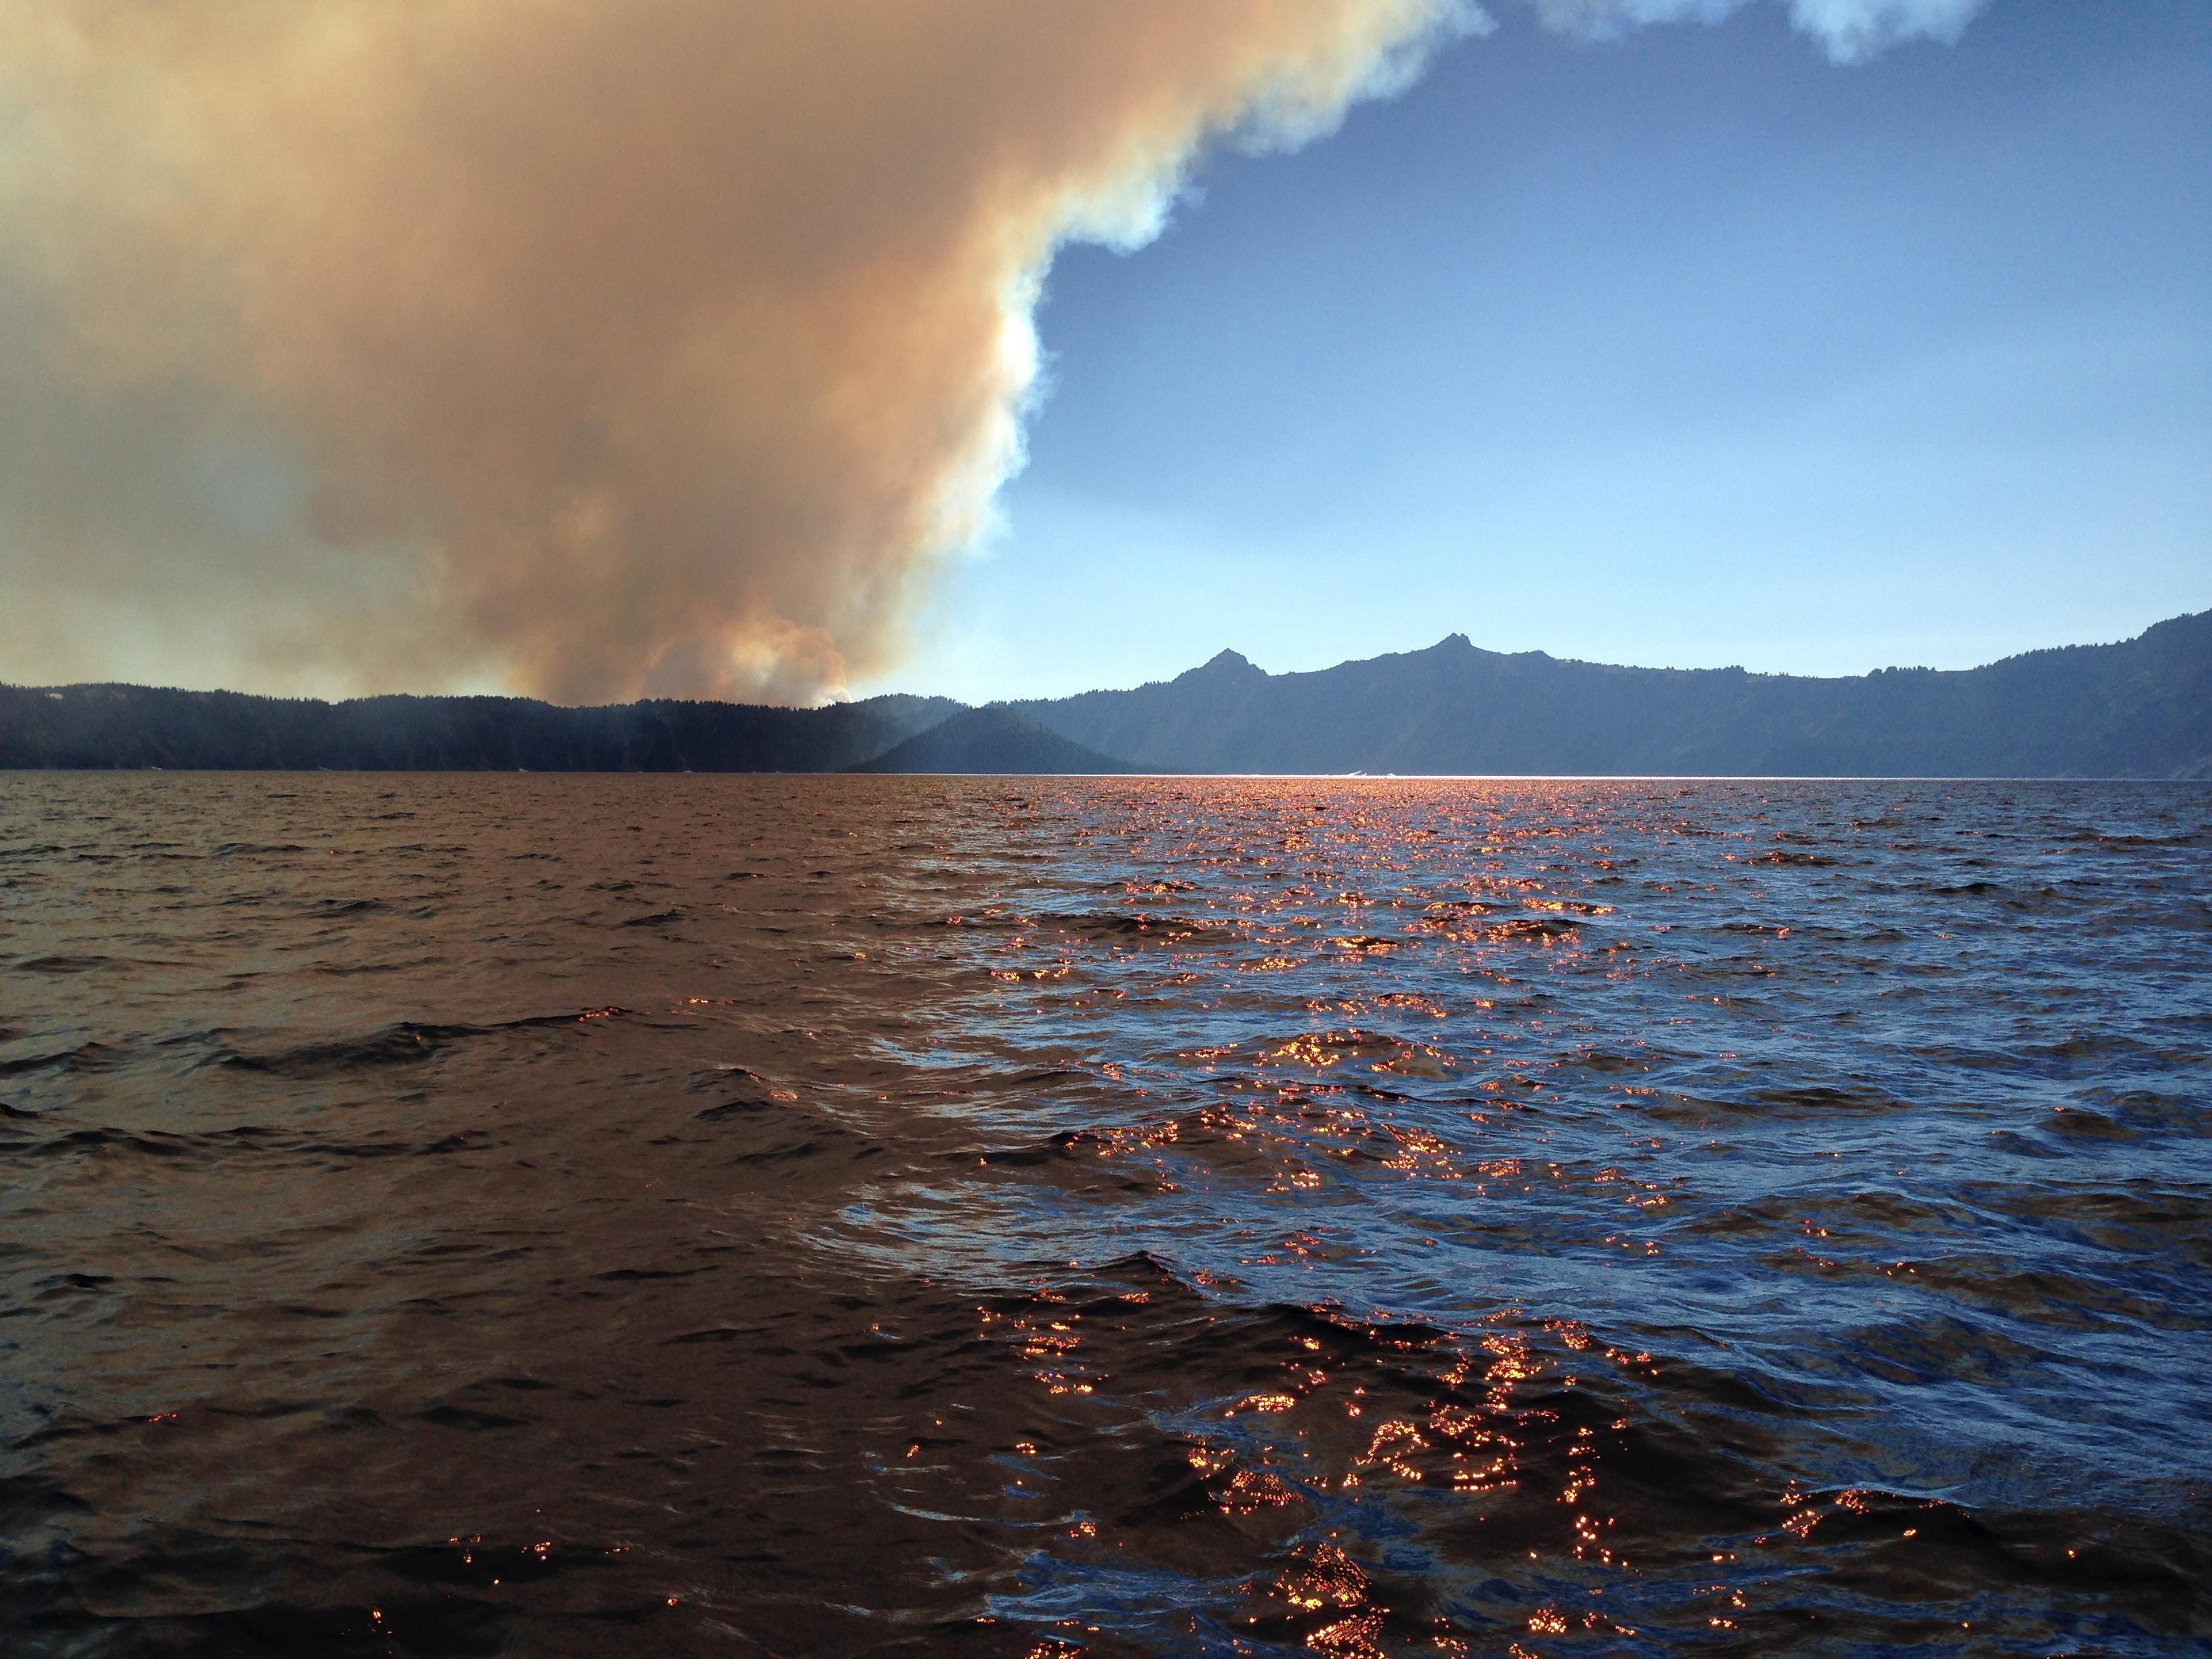 bybee-fire-crater-lake-inciweb-smoke-conditions-oregon-pctoregon.com